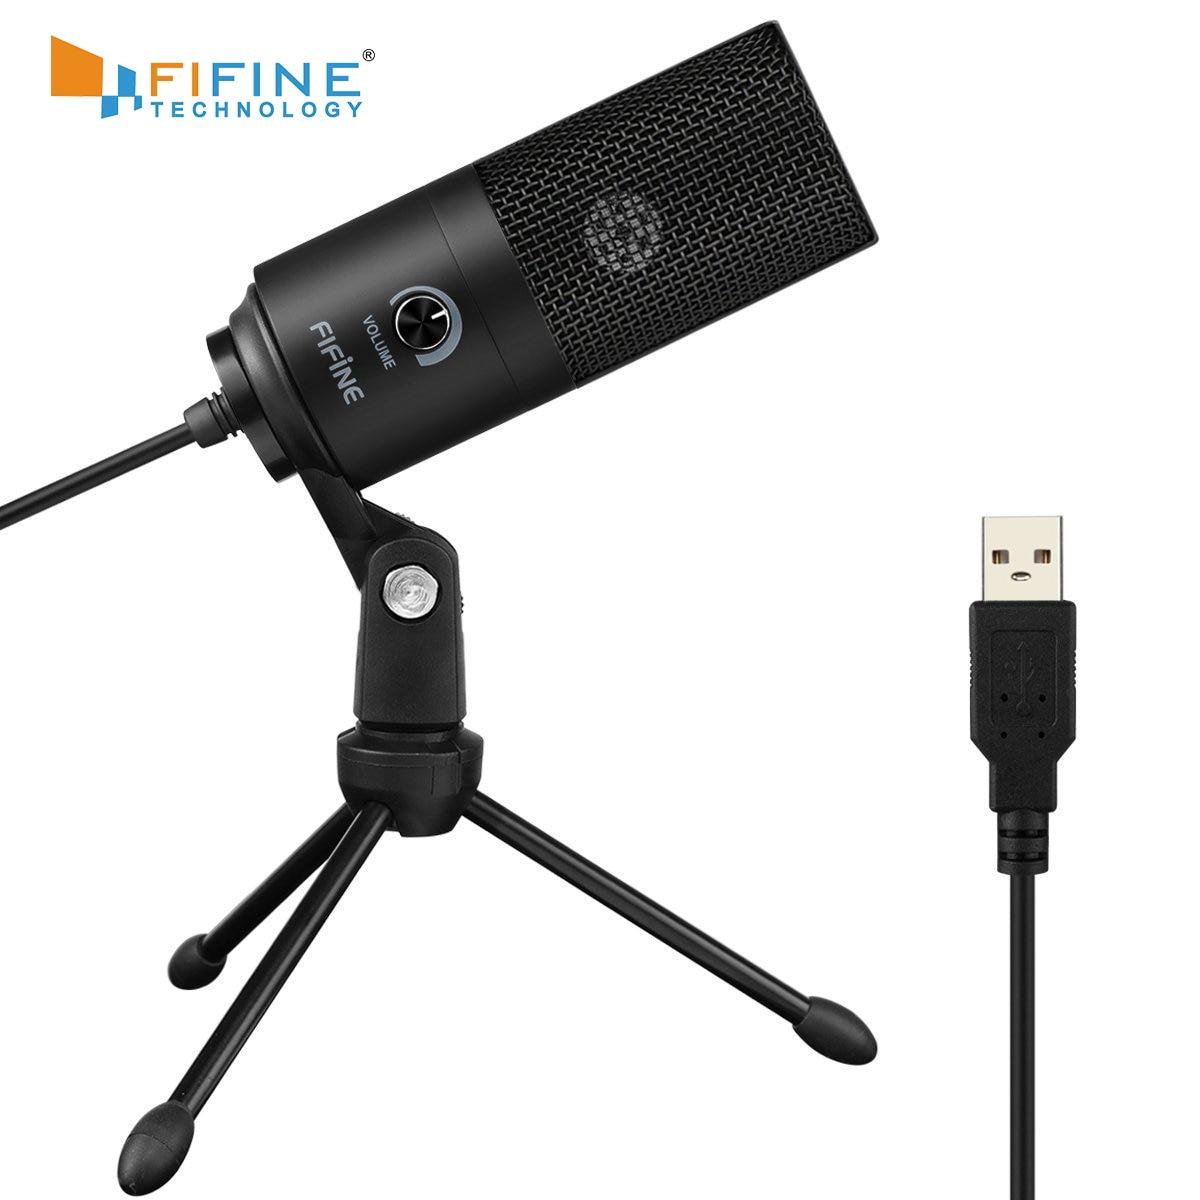 Fifine Metal USB Condenser Recording Microphone For Laptop  Windows Cardioid Studio Recording Vocals  Voice Over,YouTube-K669